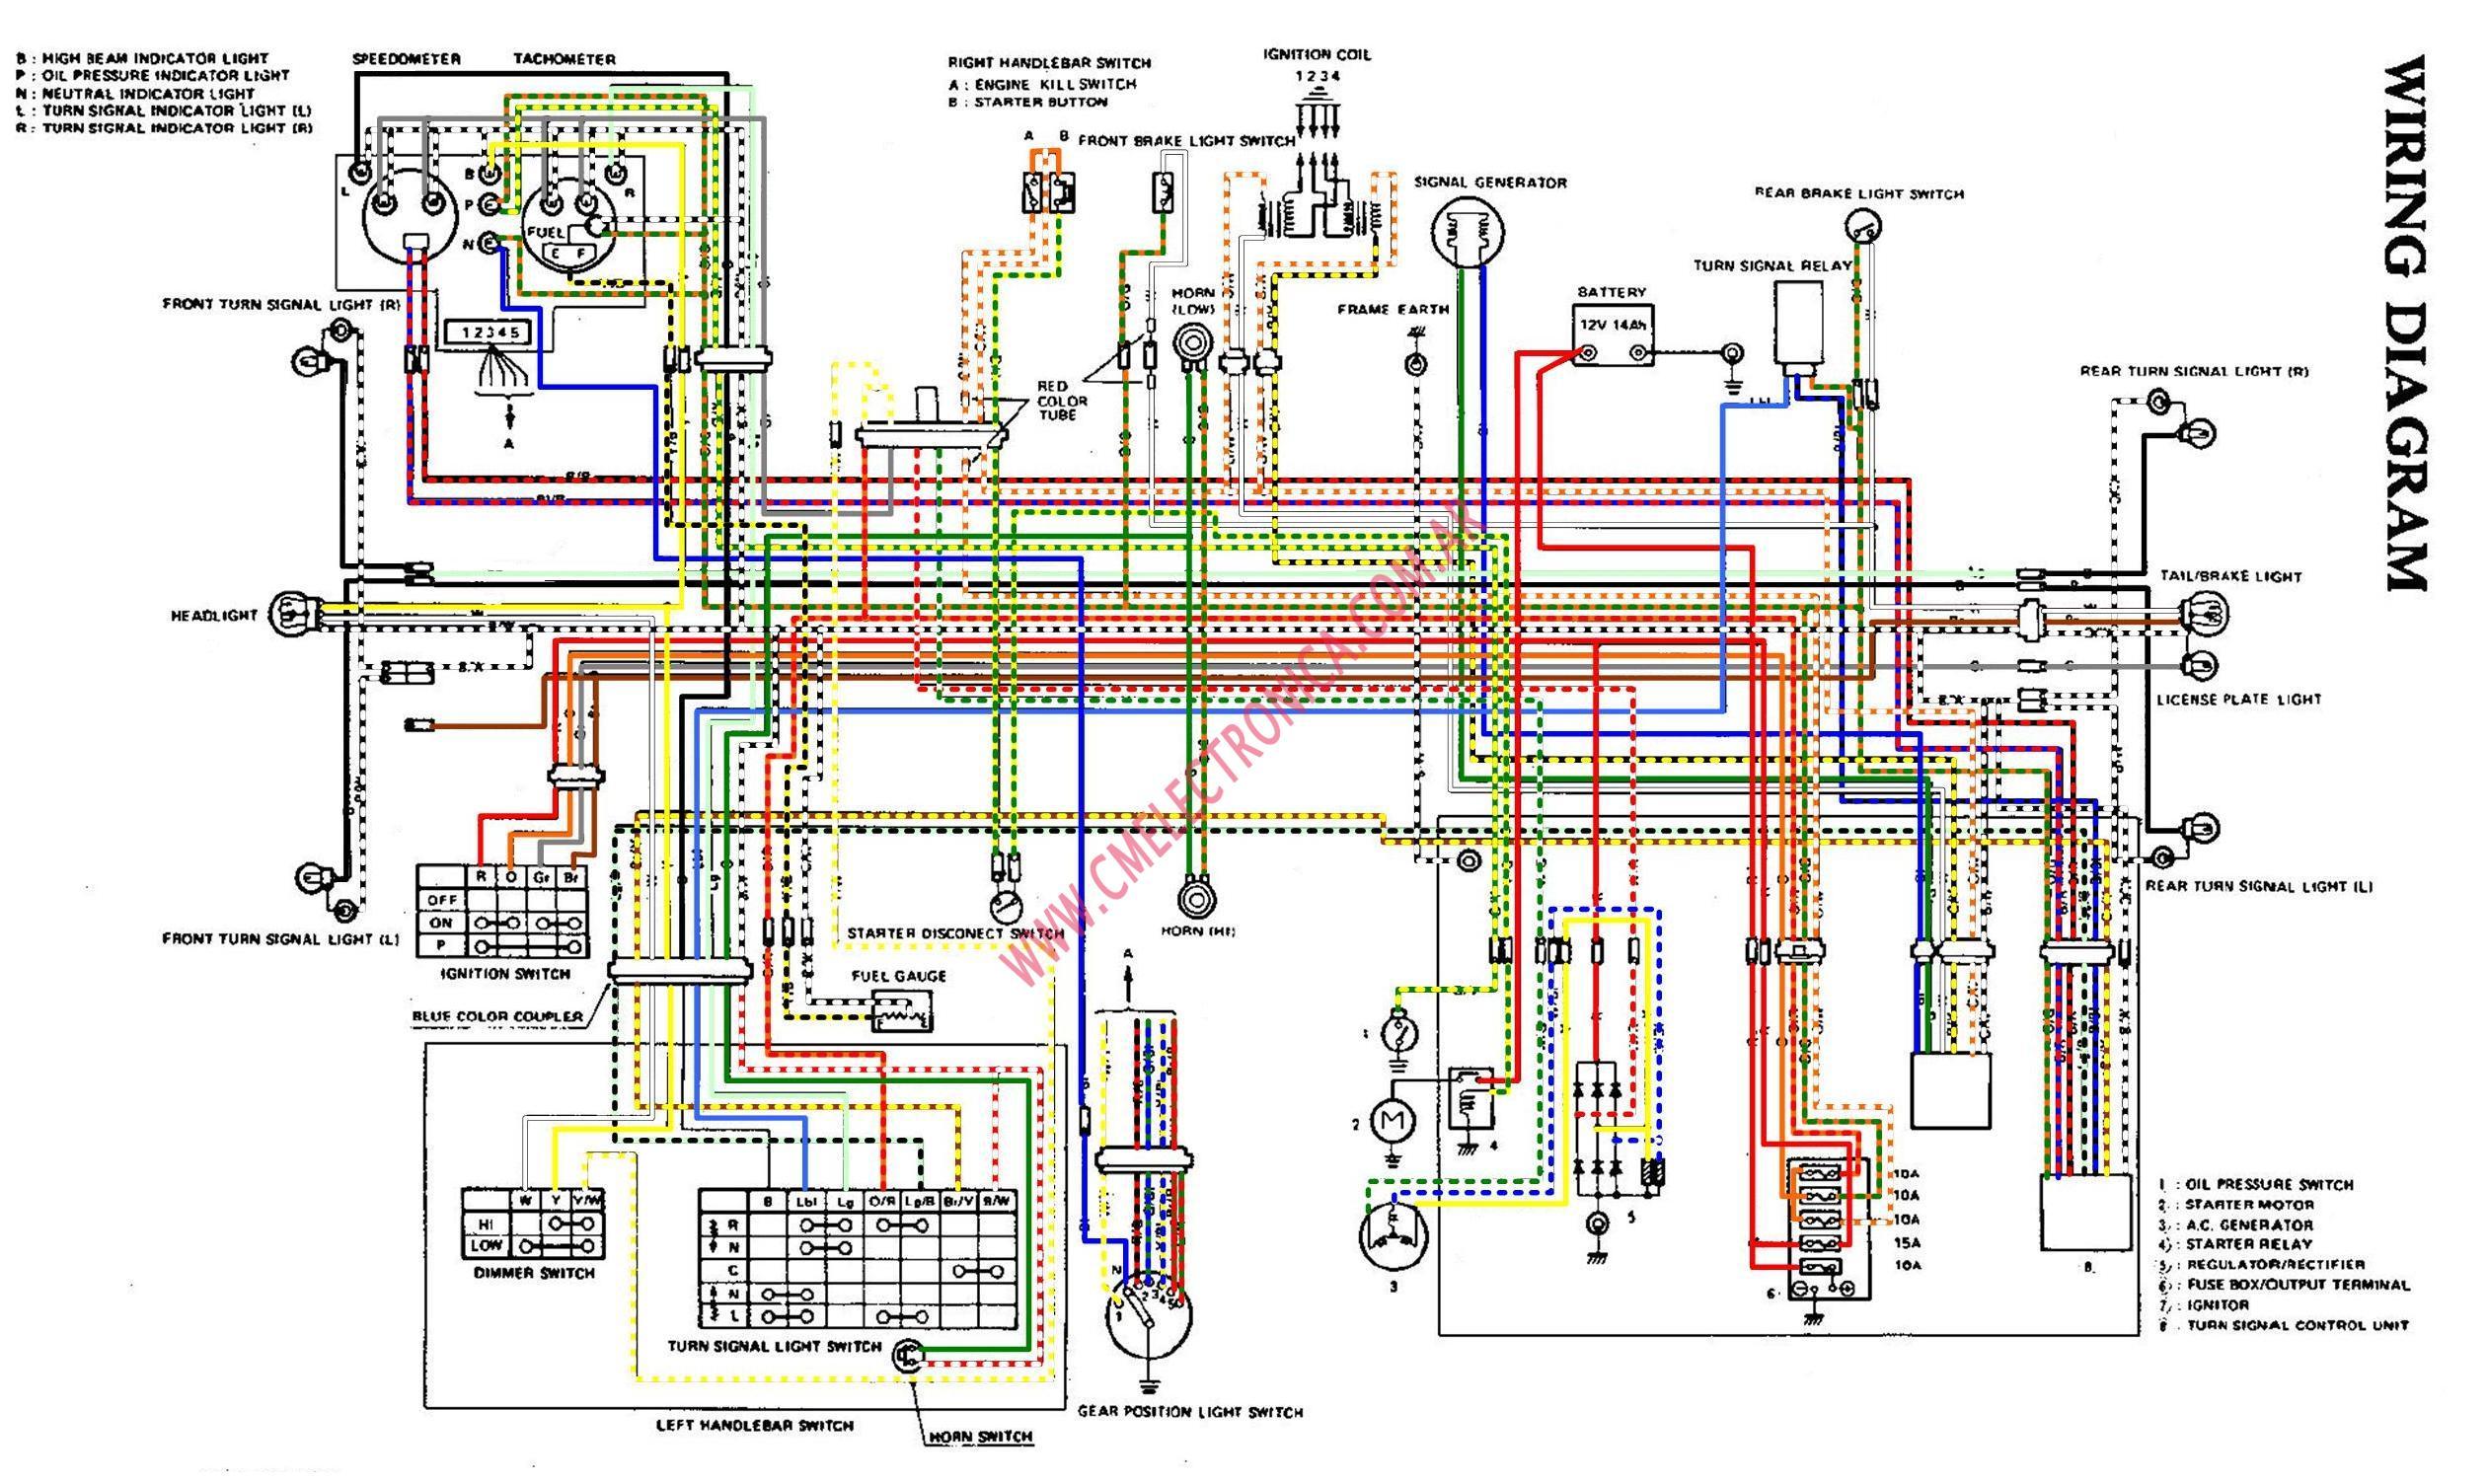 Chevy Impala Wiring Diagram Moreover Yamaha Blaster 200 Wiring Diagram